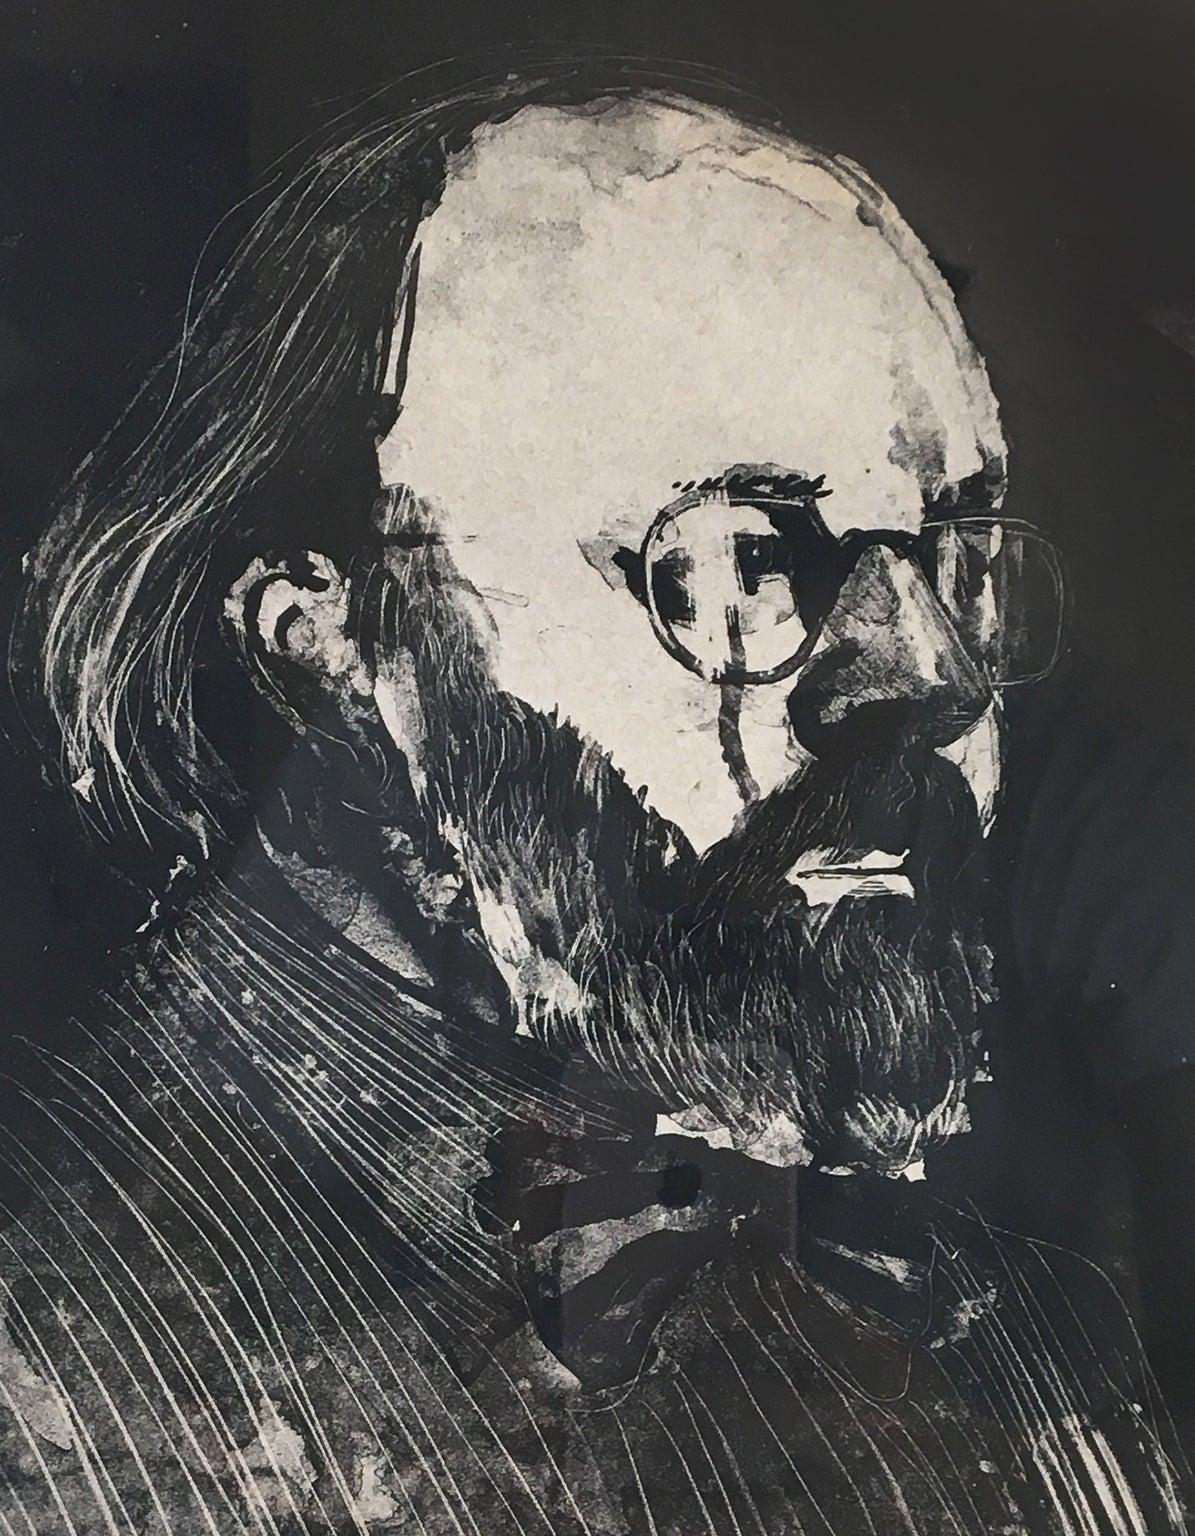 Henry '73 (Framed) David Hockney portrait drawing of Metropolitan Museum curator